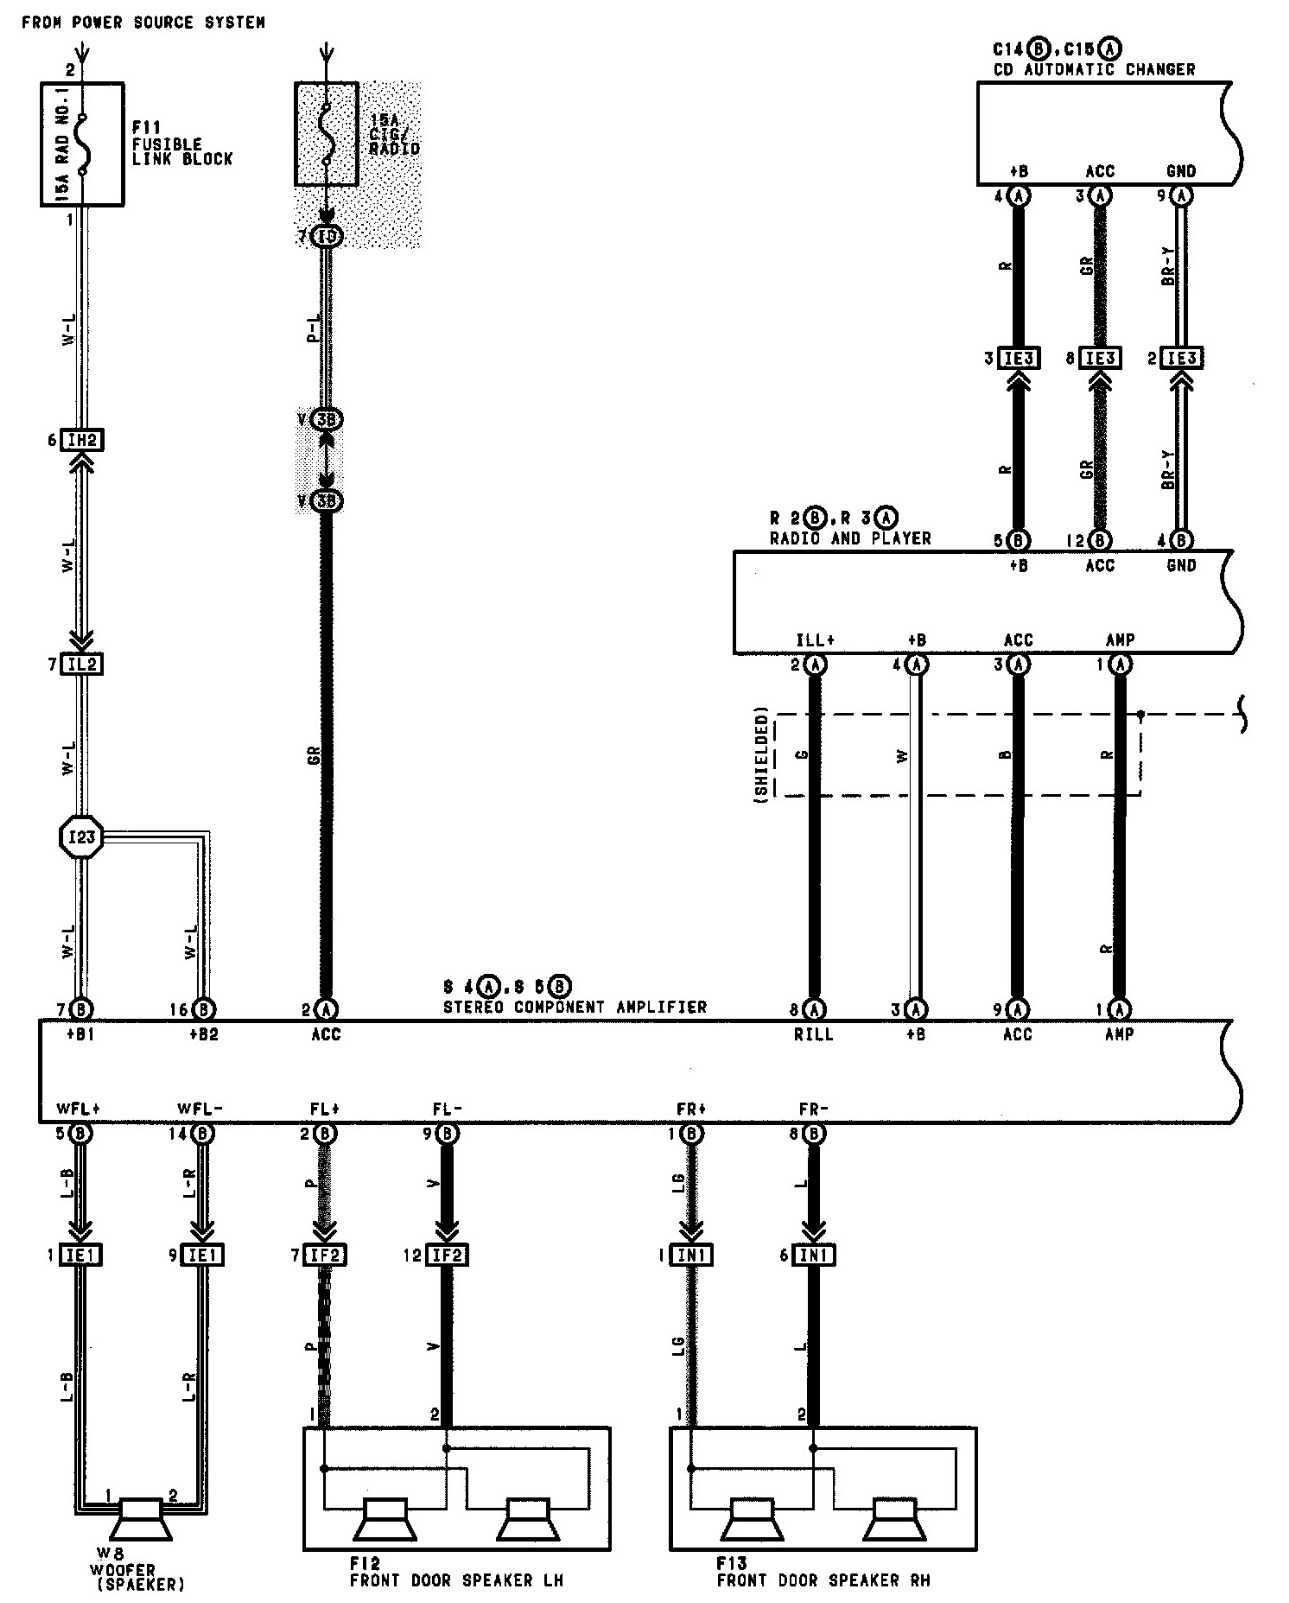 1997 Toyota Corolla Radio Wiring Diagram Free Schematic 2003 Avalon Stereo Prius